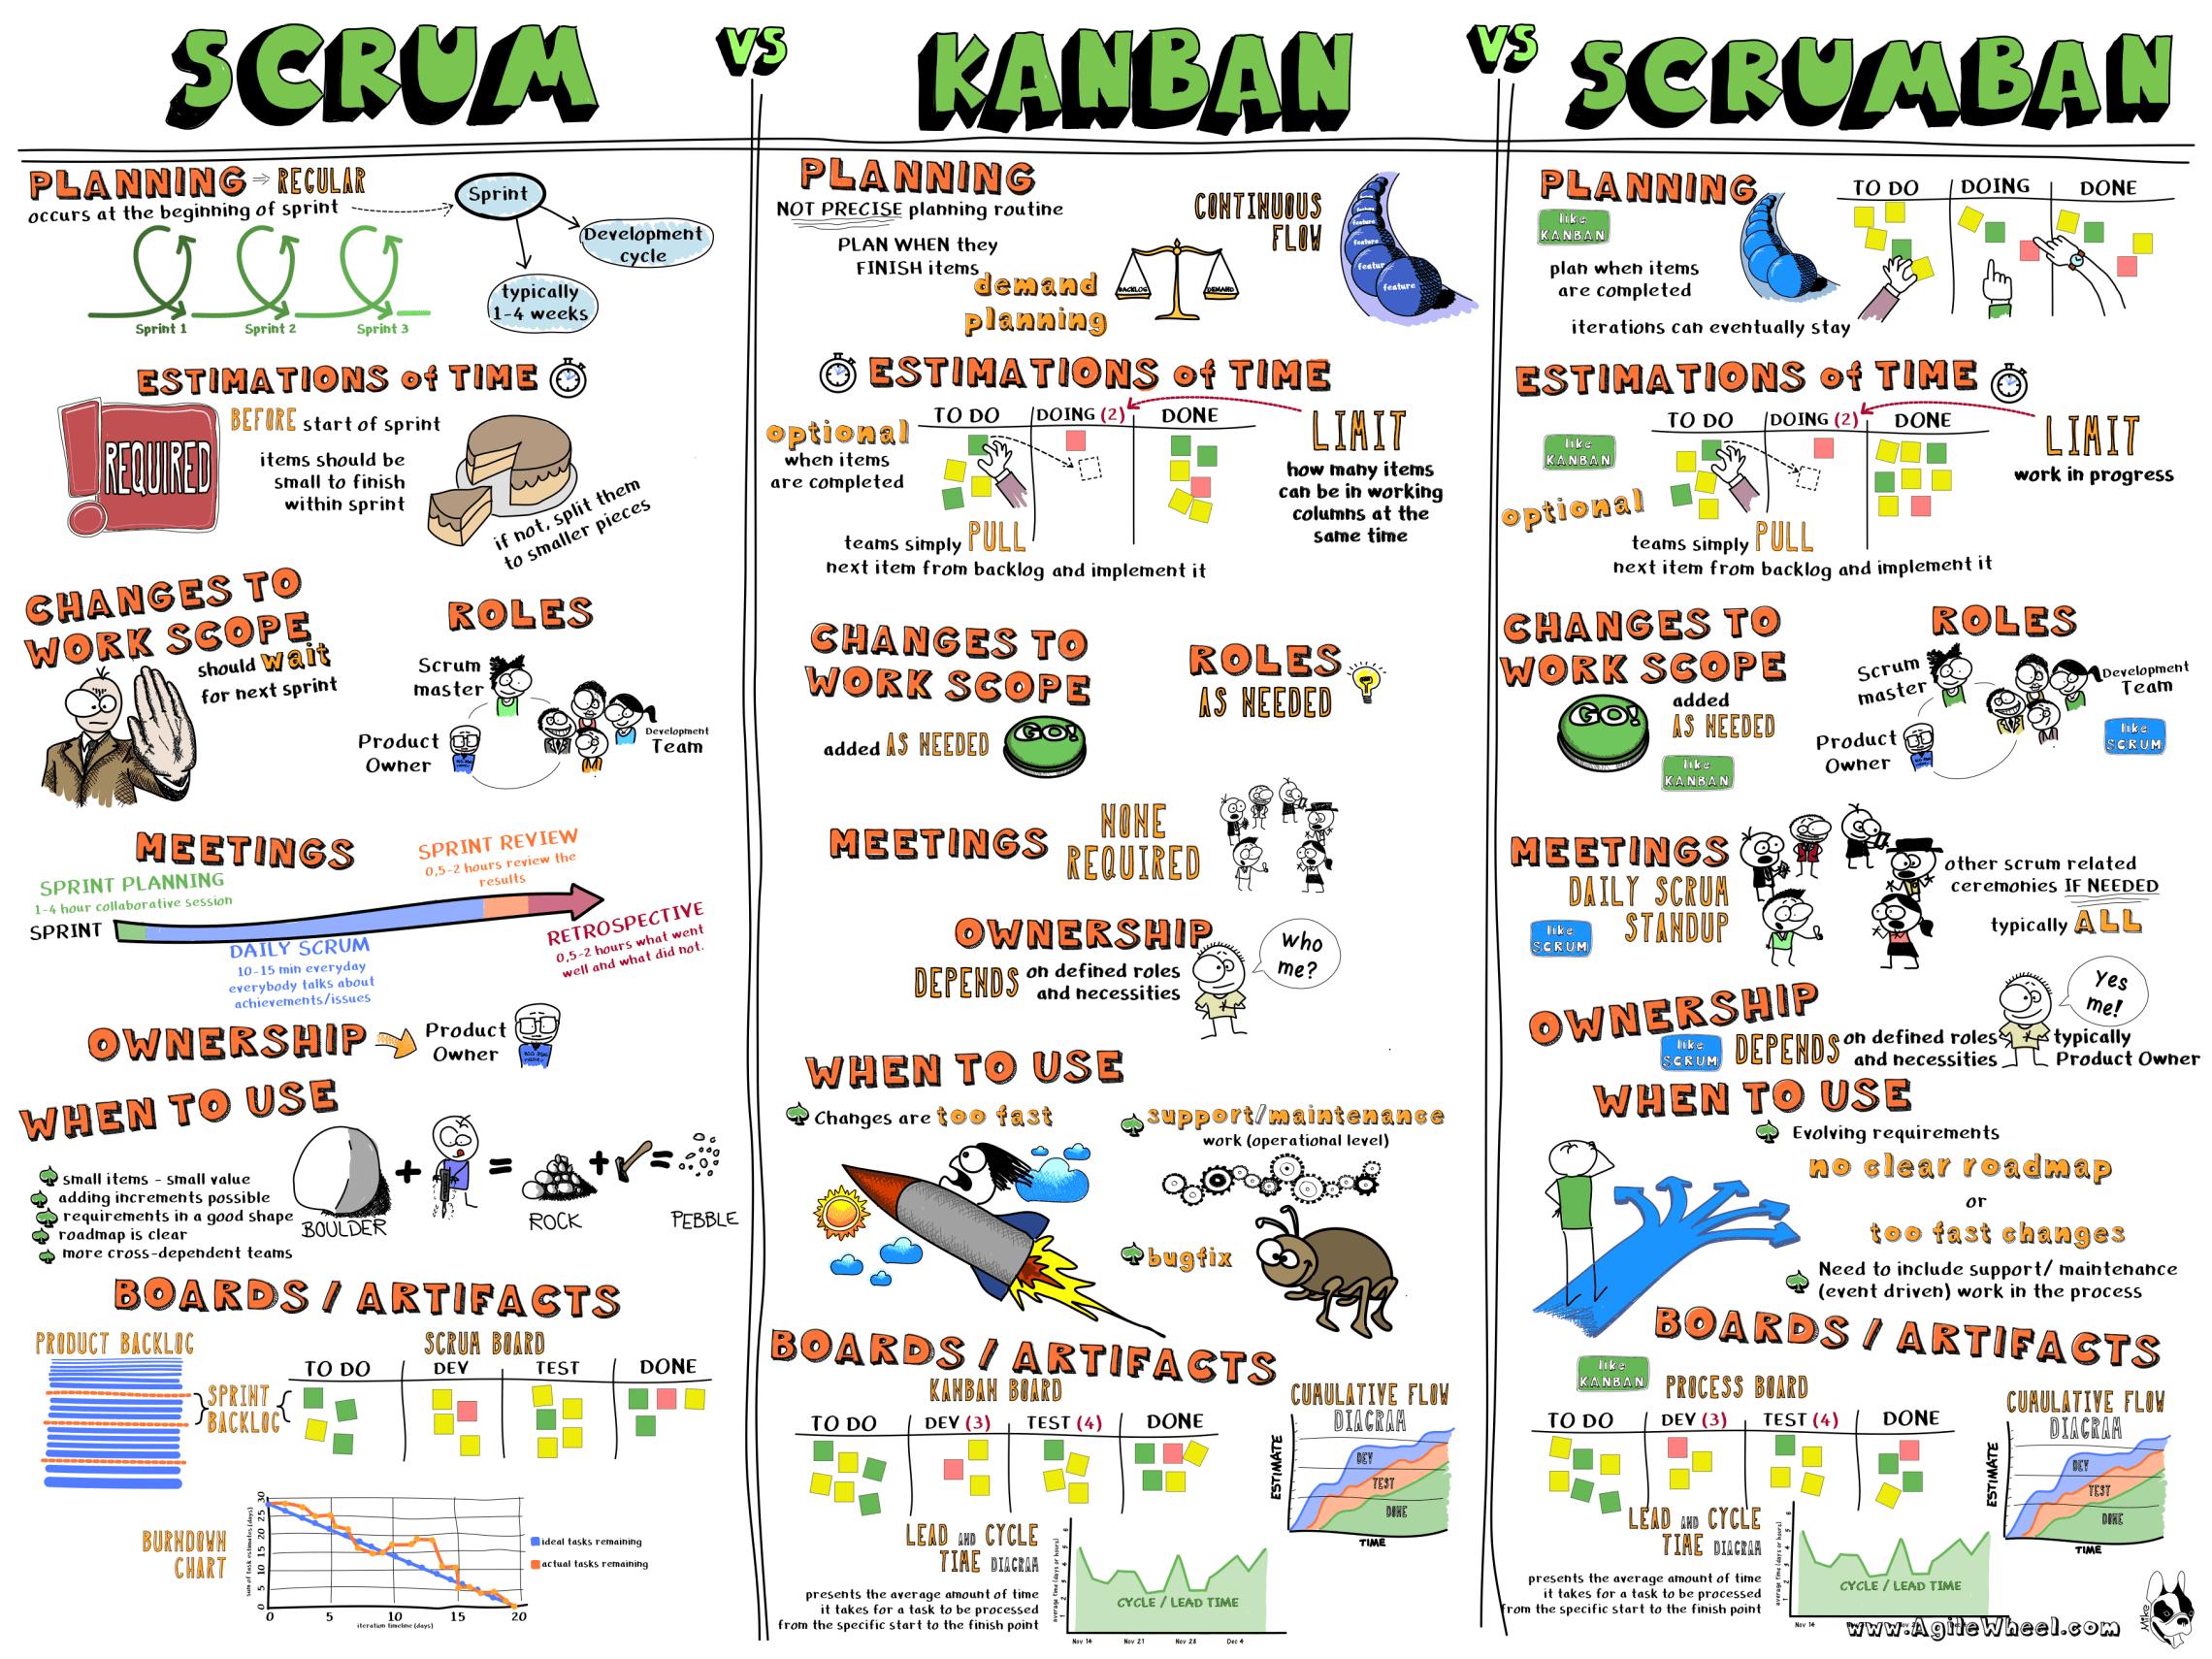 méthode Agile Kanban Scrum et Scrumban